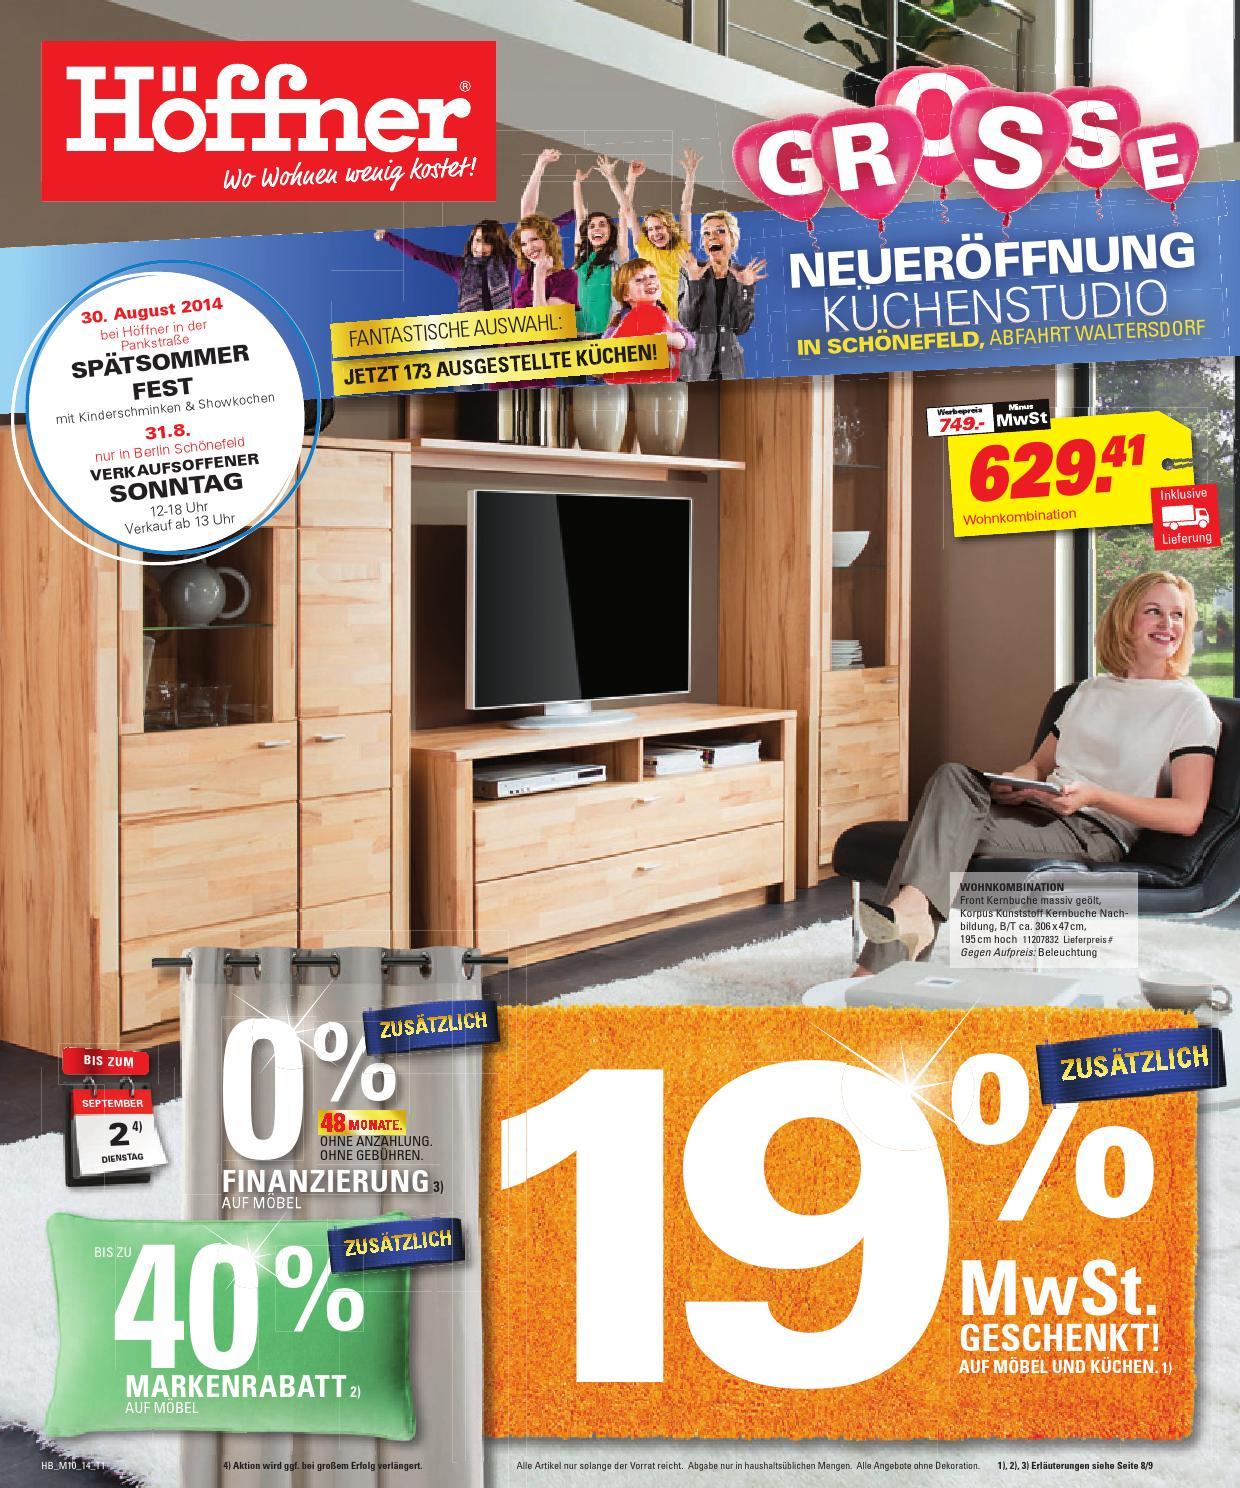 h ffner gro e neuer ffnung by berlin medien gmbh issuu. Black Bedroom Furniture Sets. Home Design Ideas